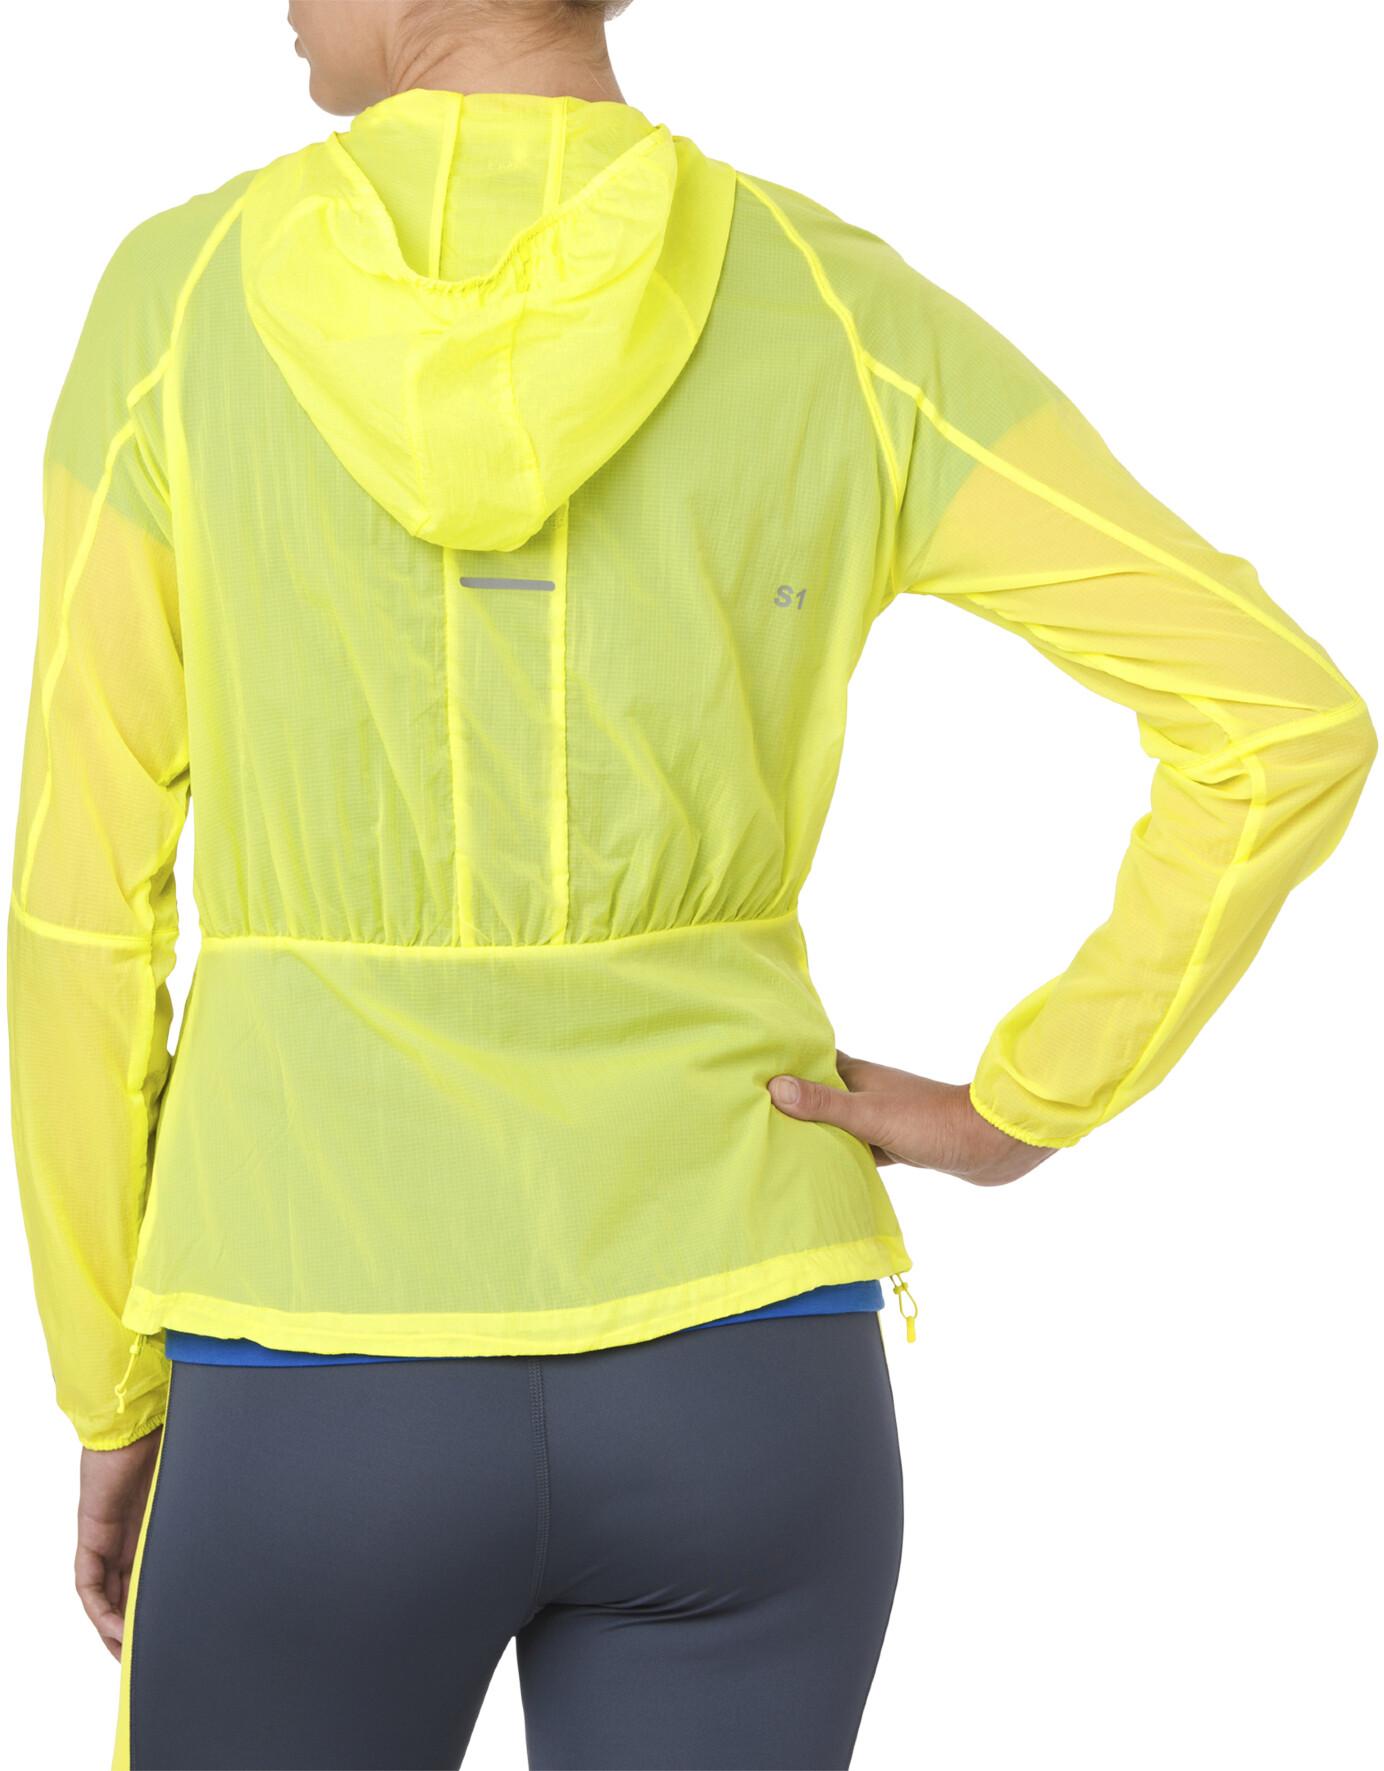 e9ba3b9d584 asics Packable - Chaqueta Running Mujer - amarillo